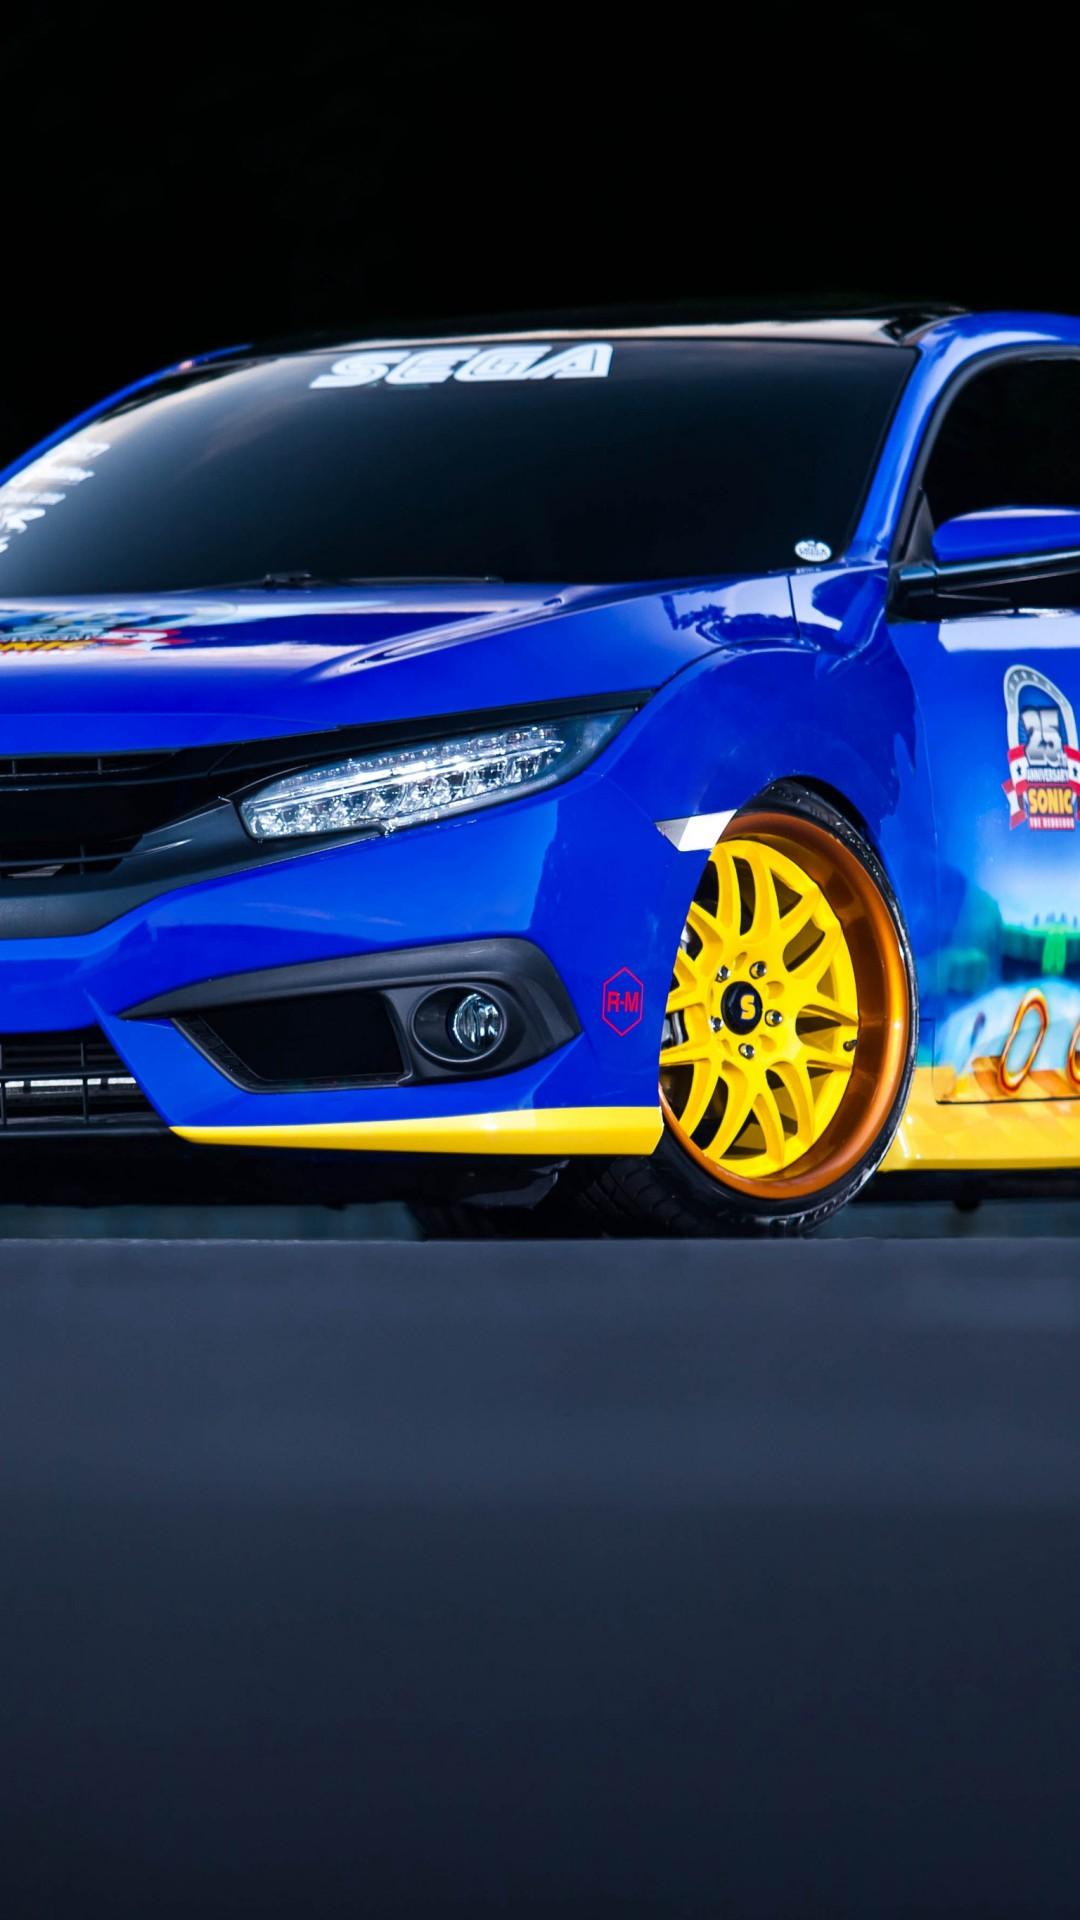 Honda Civic Hybrid >> Wallpaper Honda's Sonic Civic, sedan, blue, sonic, Cars ...